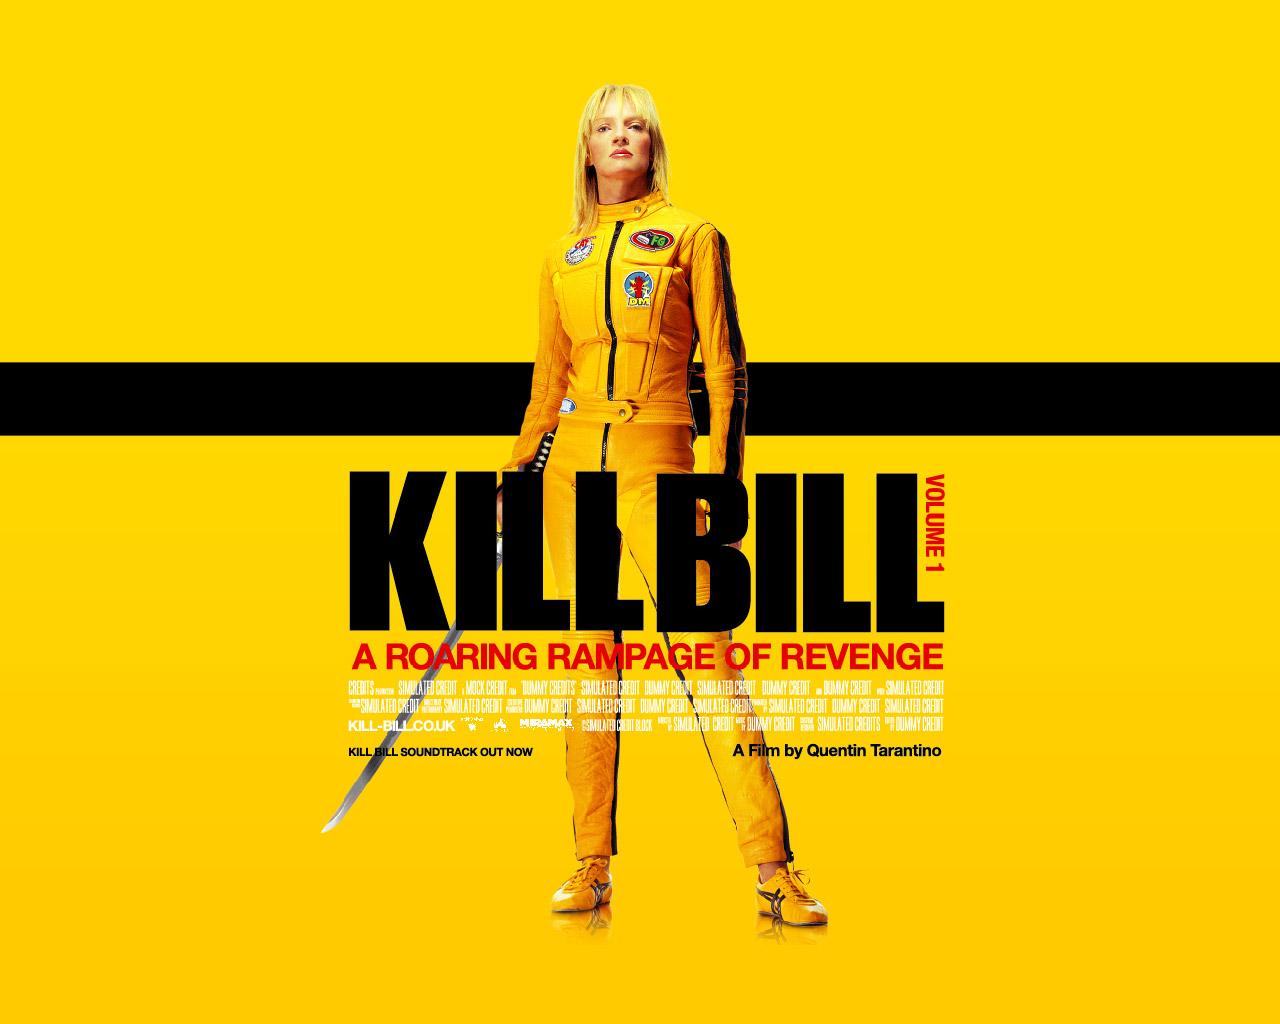 http://2.bp.blogspot.com/-Rs5eUF0JcGA/Taf9HCsHnII/AAAAAAAAABw/Q8OUlW9l1Ig/s1600/kill_bill_wall03.jpg